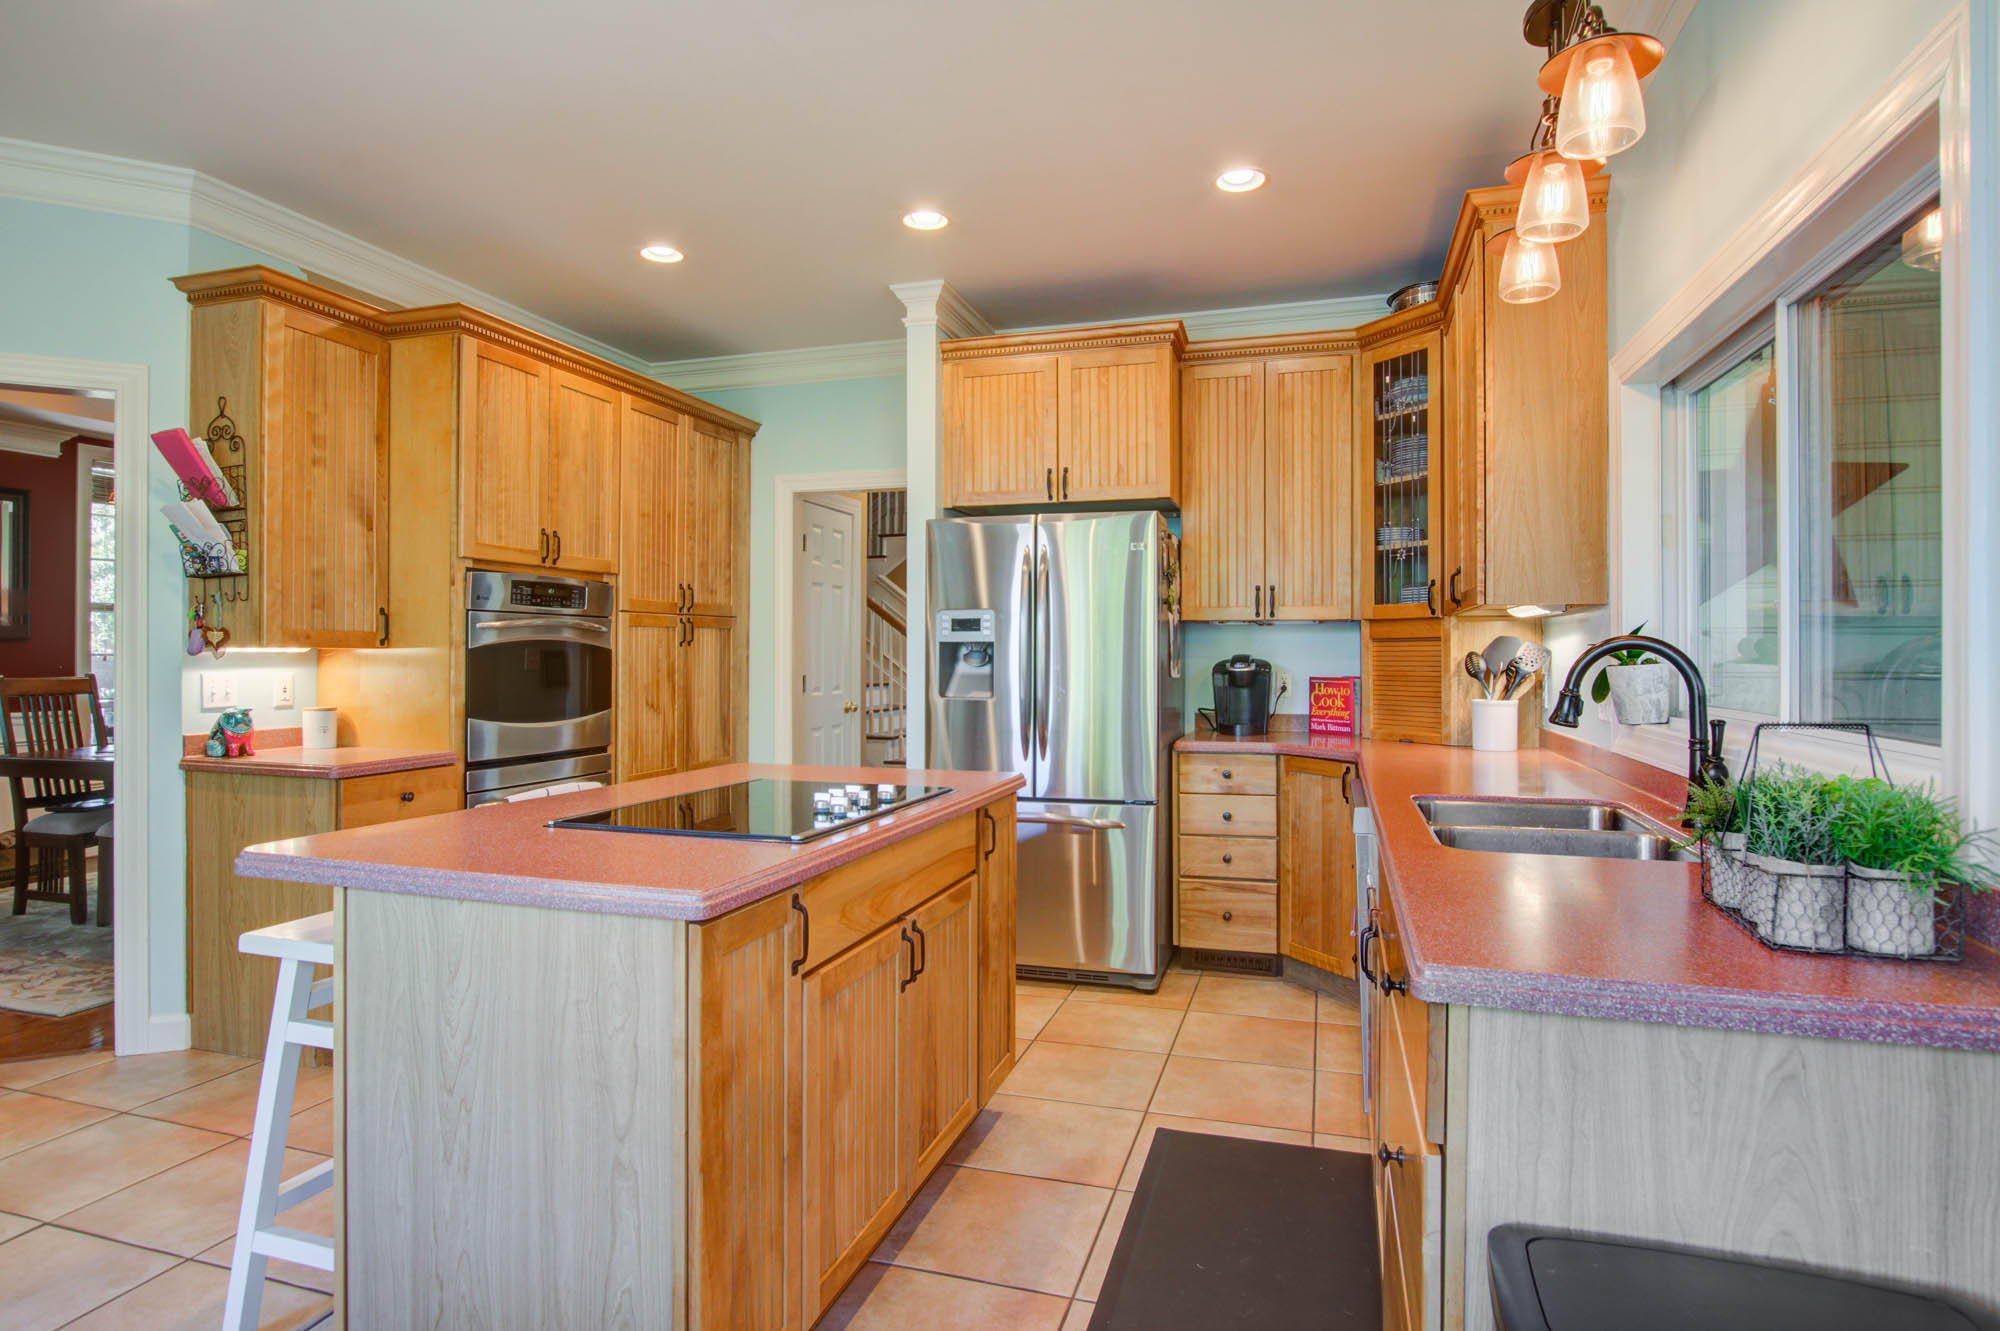 St Thomas Point Homes For Sale - 307 Jamesbury, Charleston, SC - 33